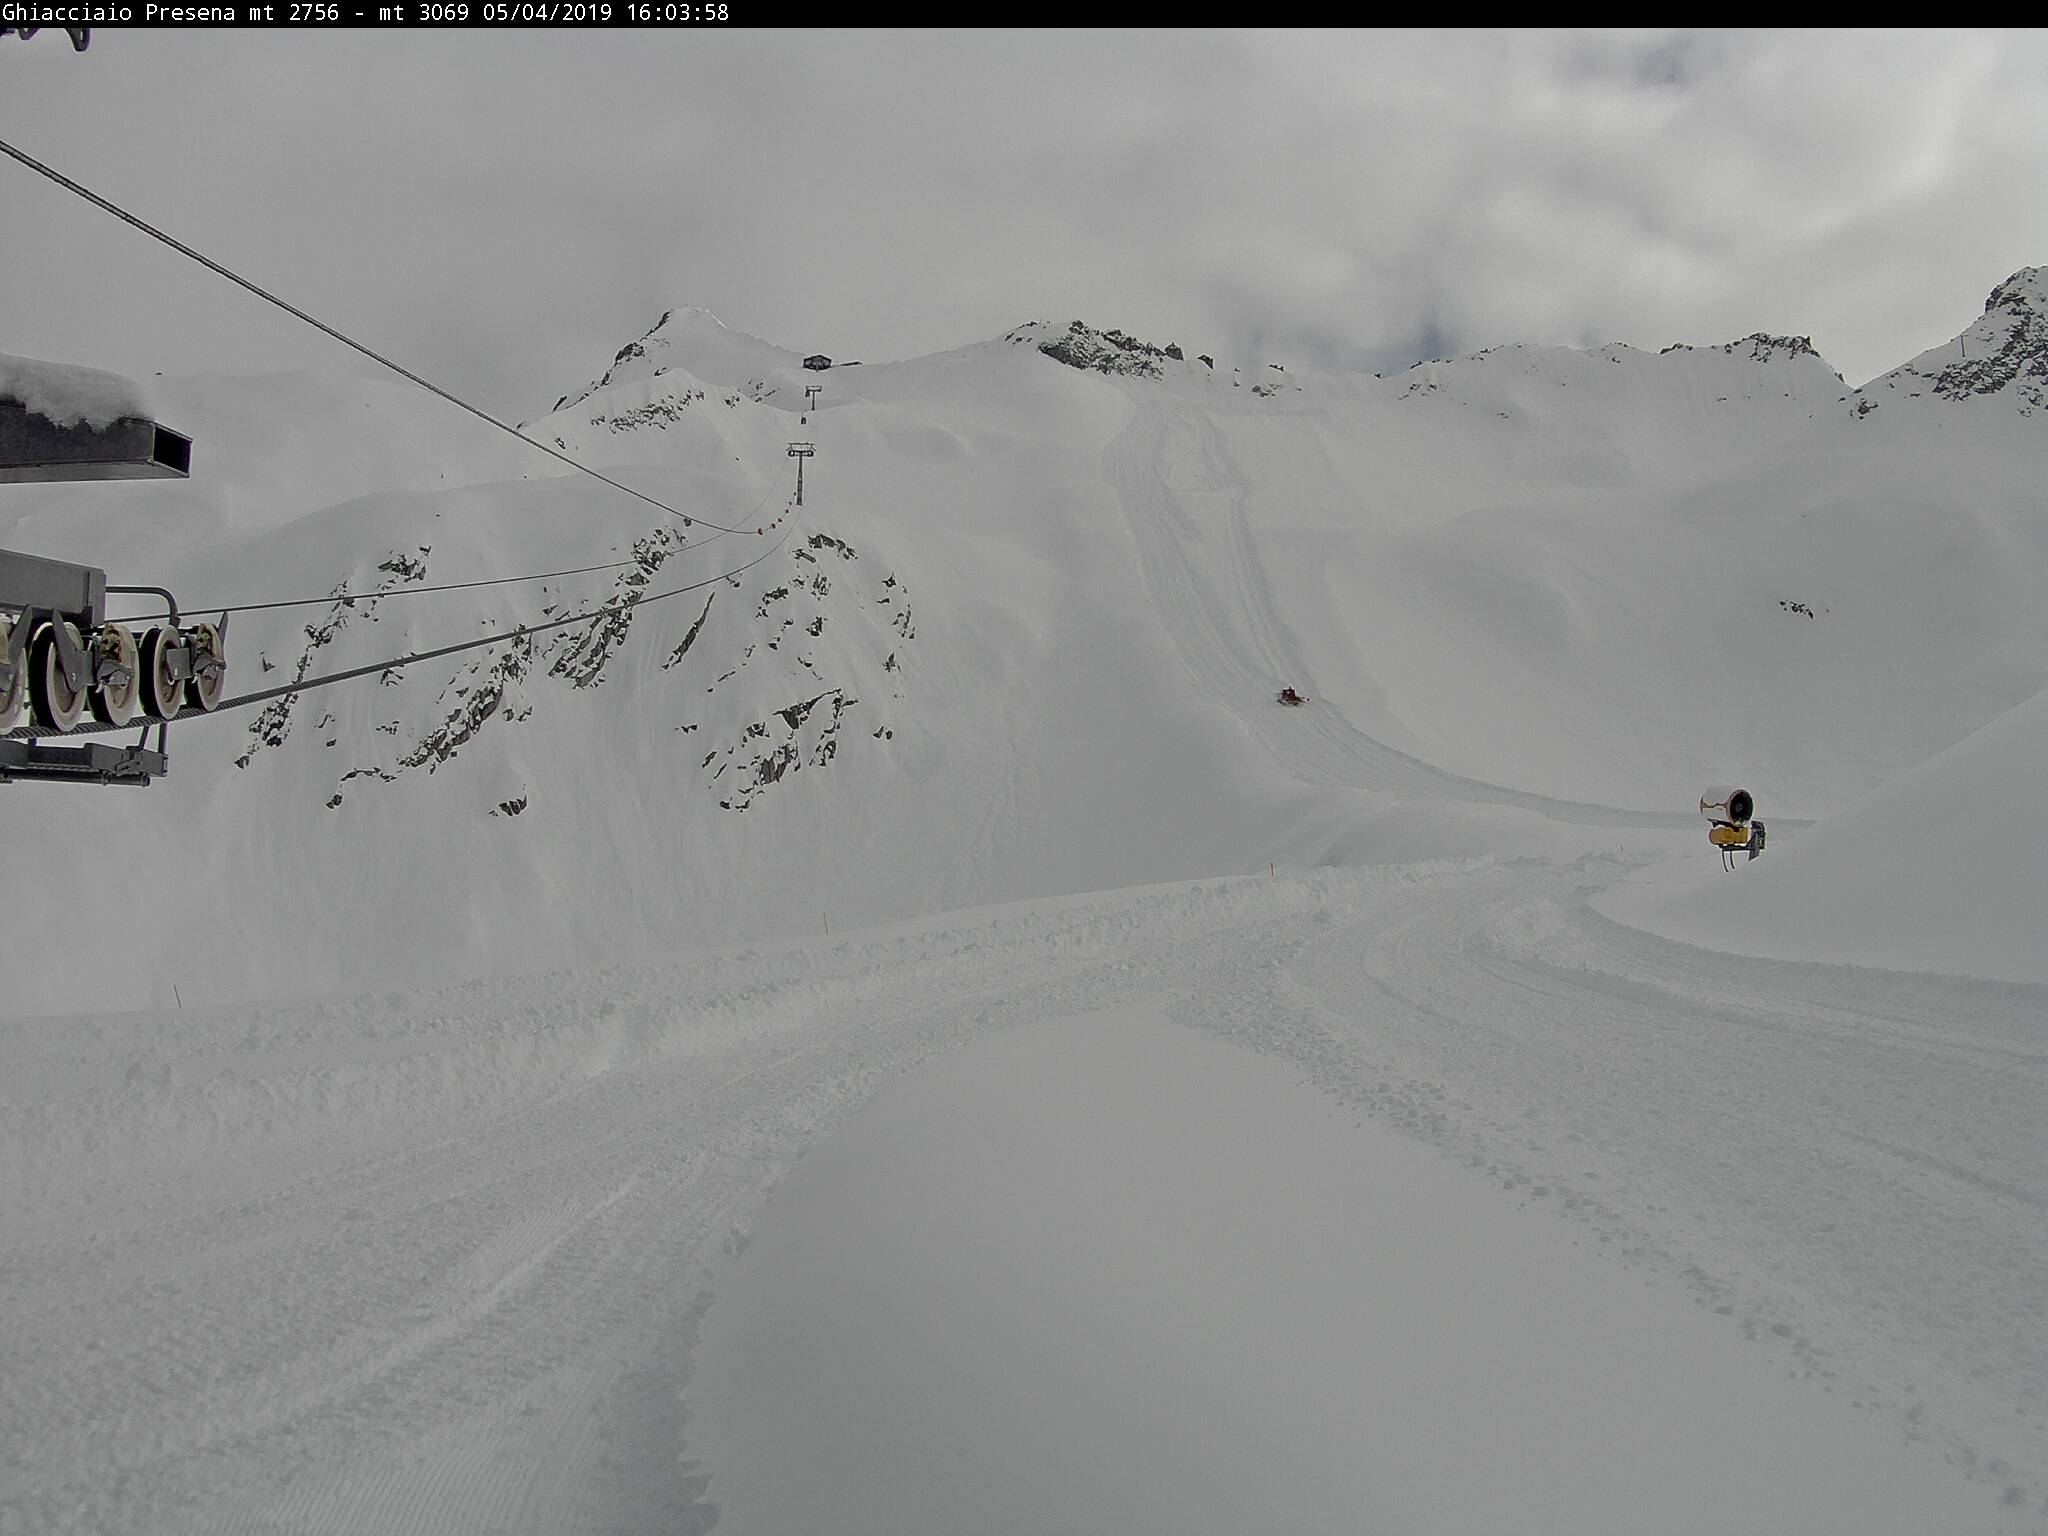 Nowcasting nivoglaciale Alpi primavera 2019-presena2019.04.05.jpg